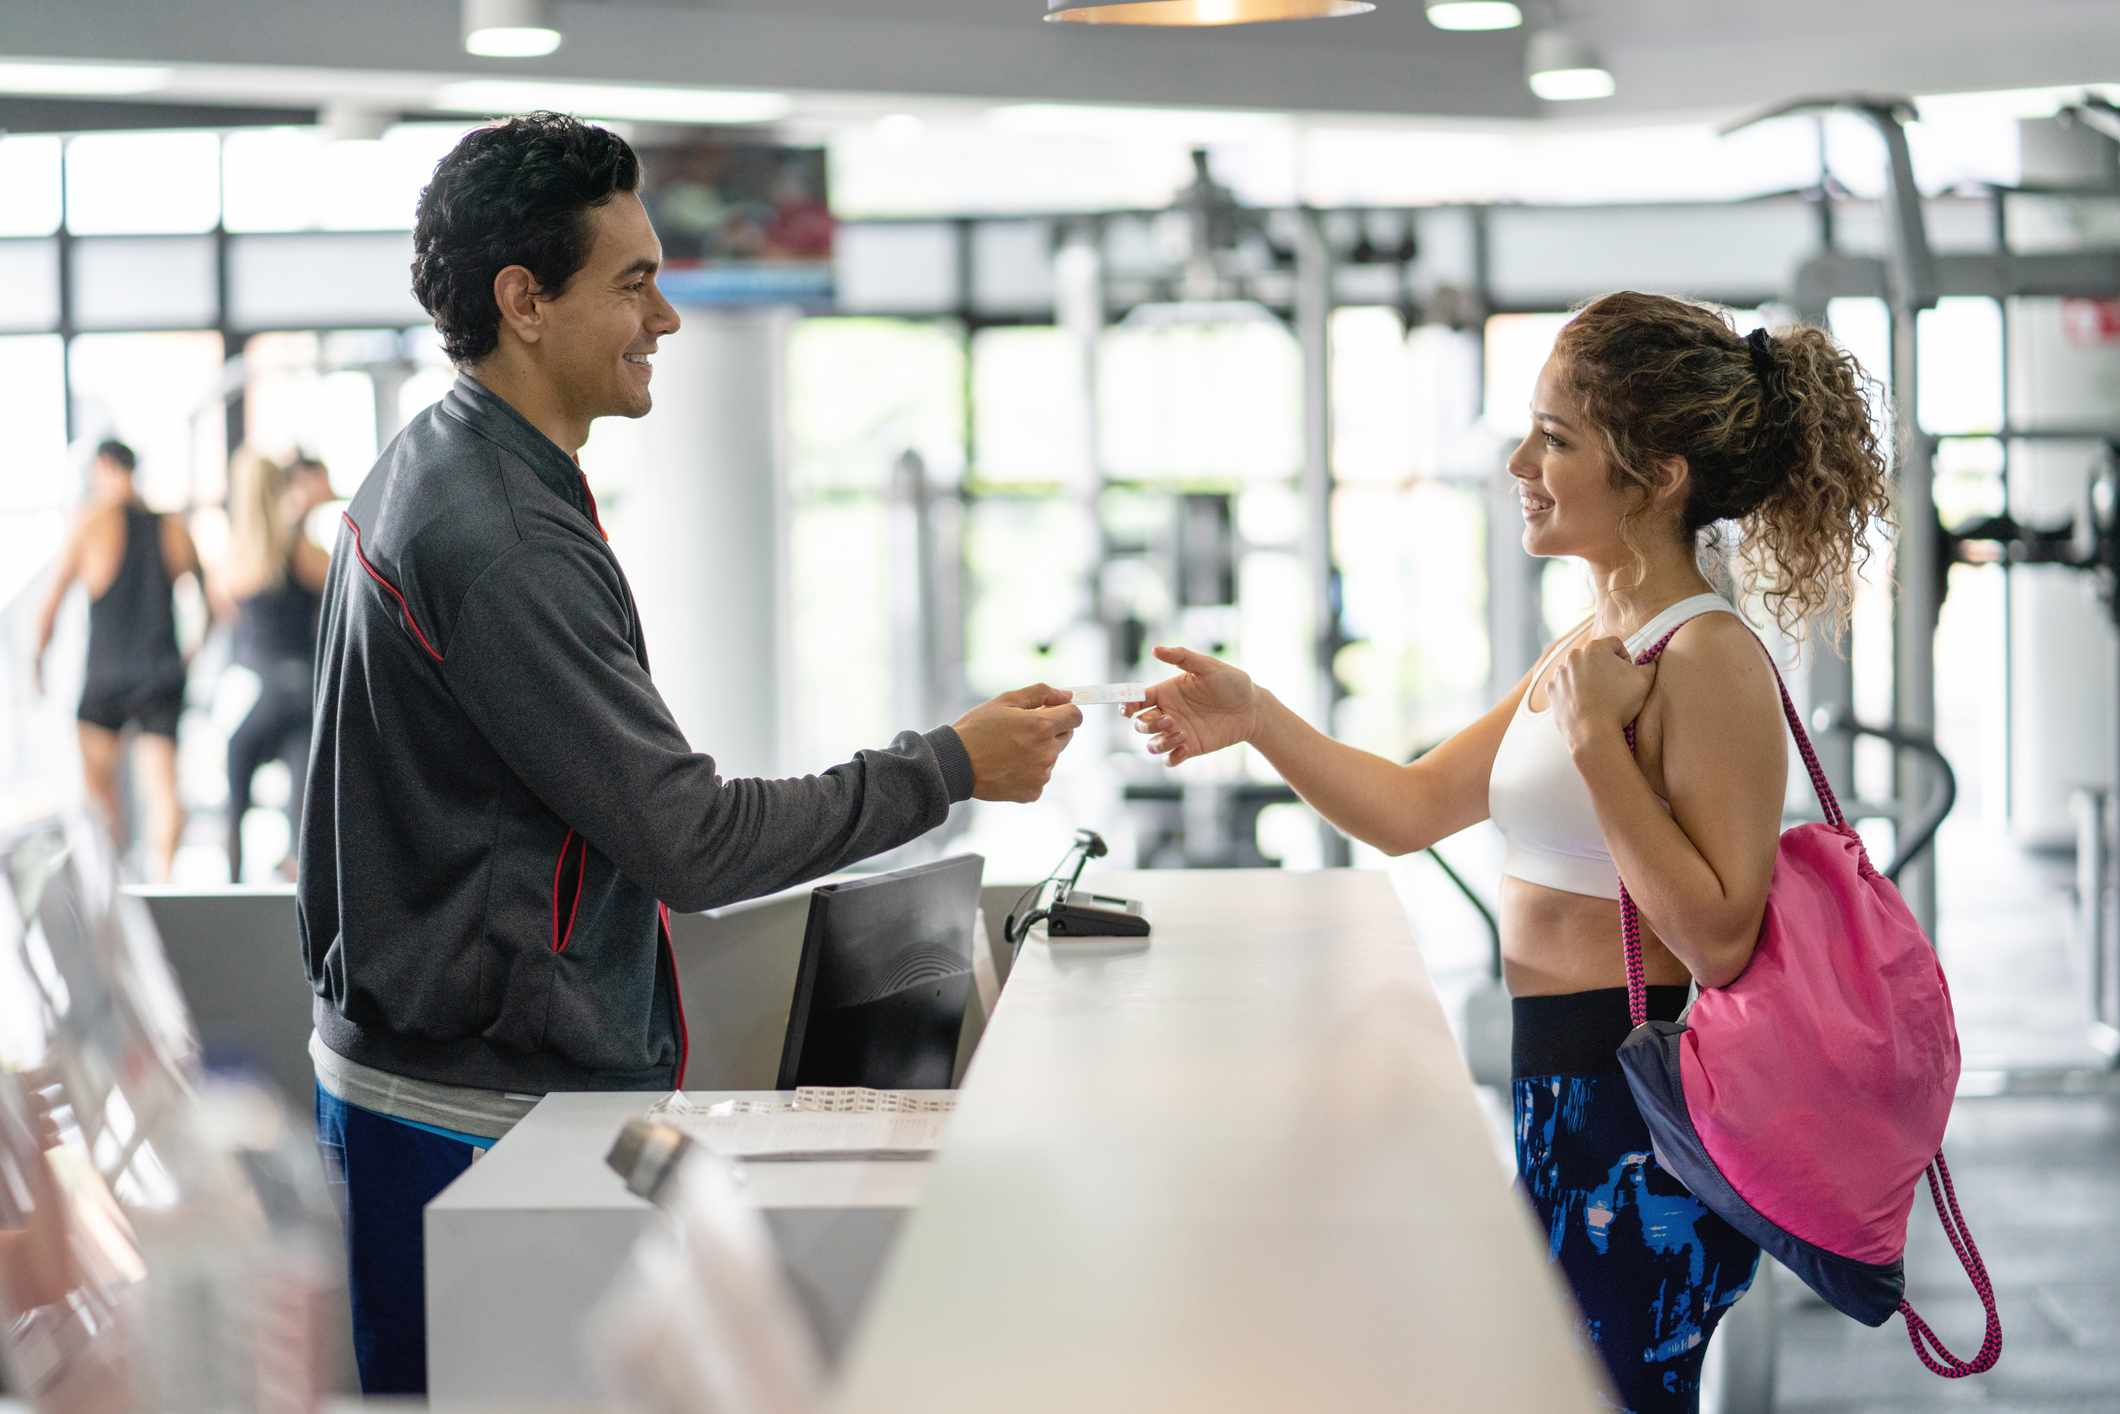 Cheerful employee at the gym handing a membership card to beautiful female customer